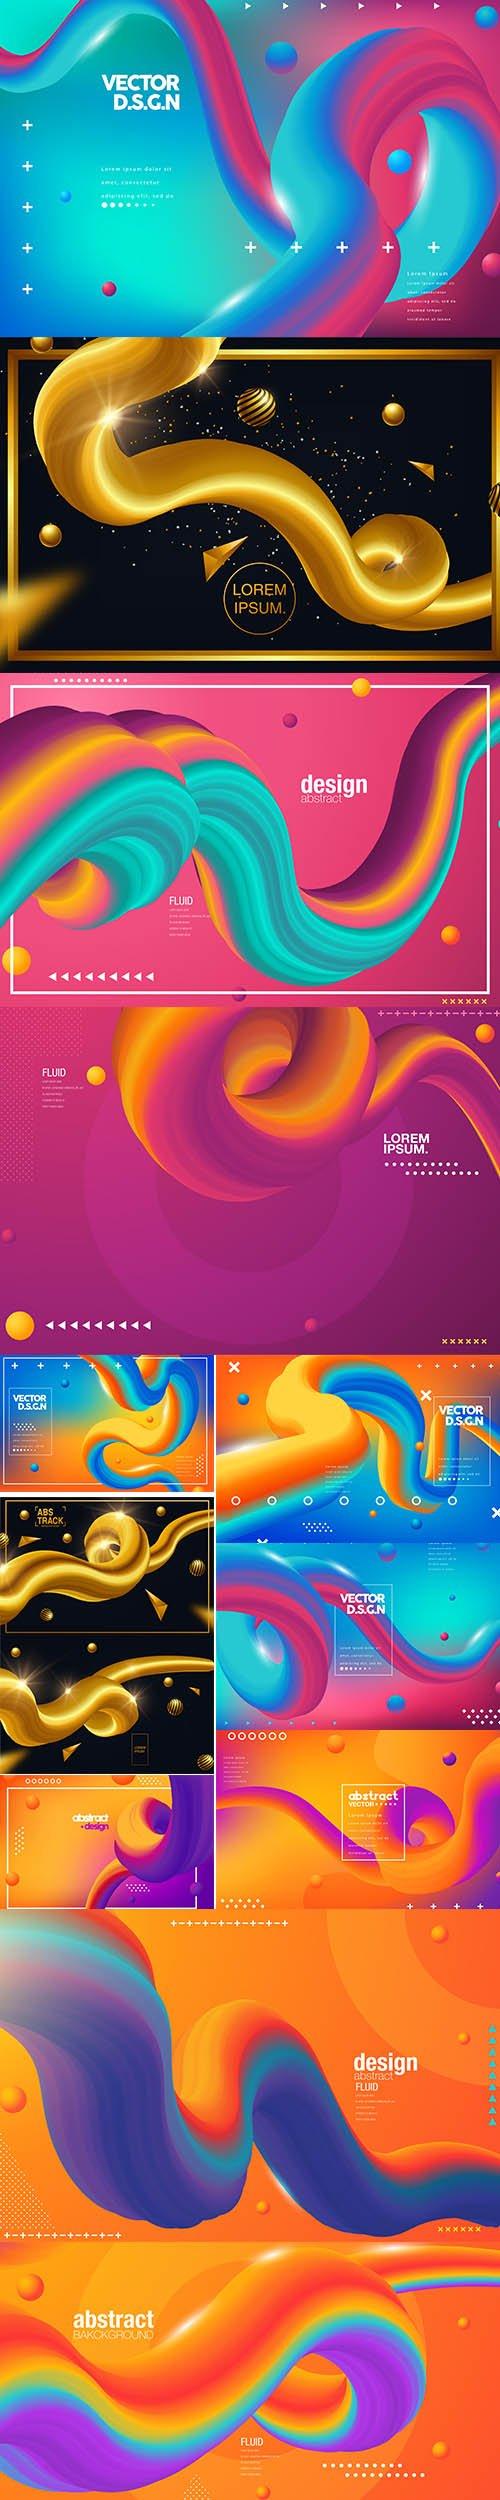 Creative Design 3D Flow Shape Premium Illustrations